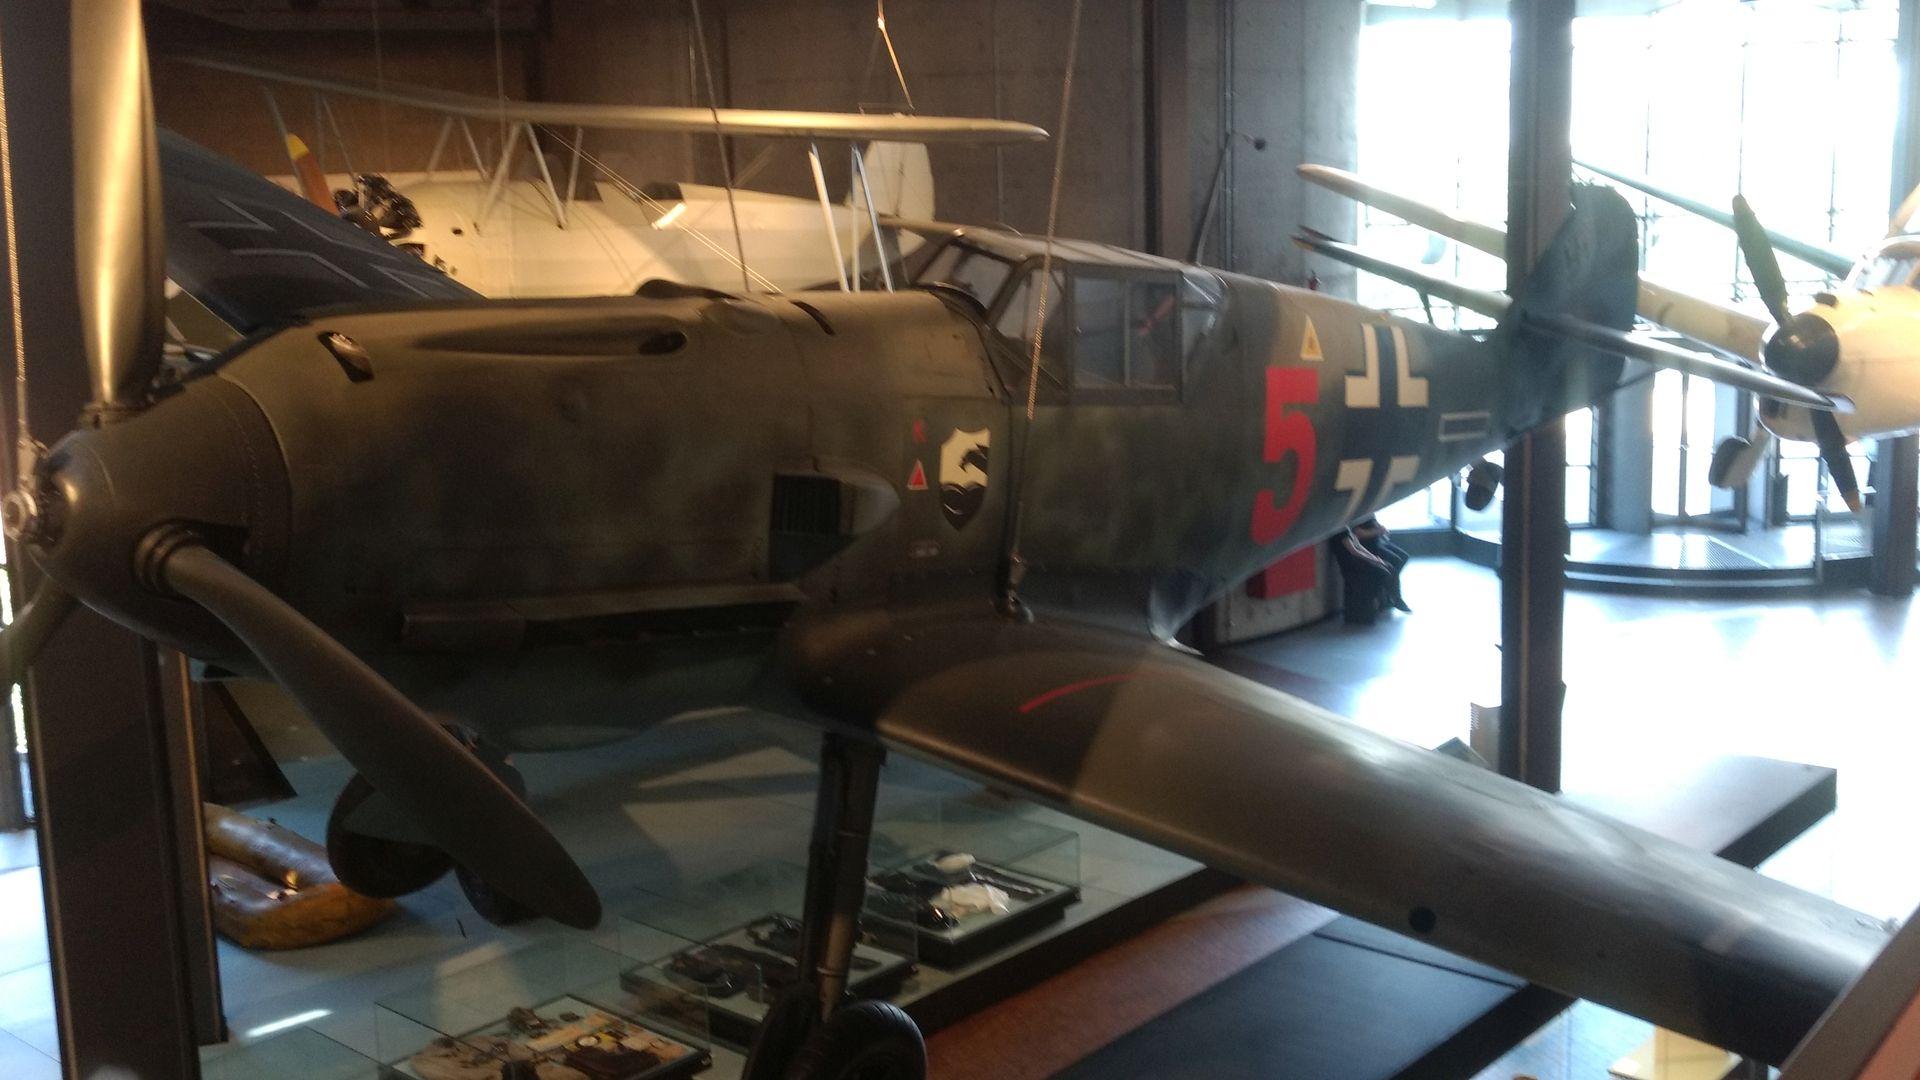 Deutsches Technikmuseum Berlin 43626077341_8a6c2eb411_o